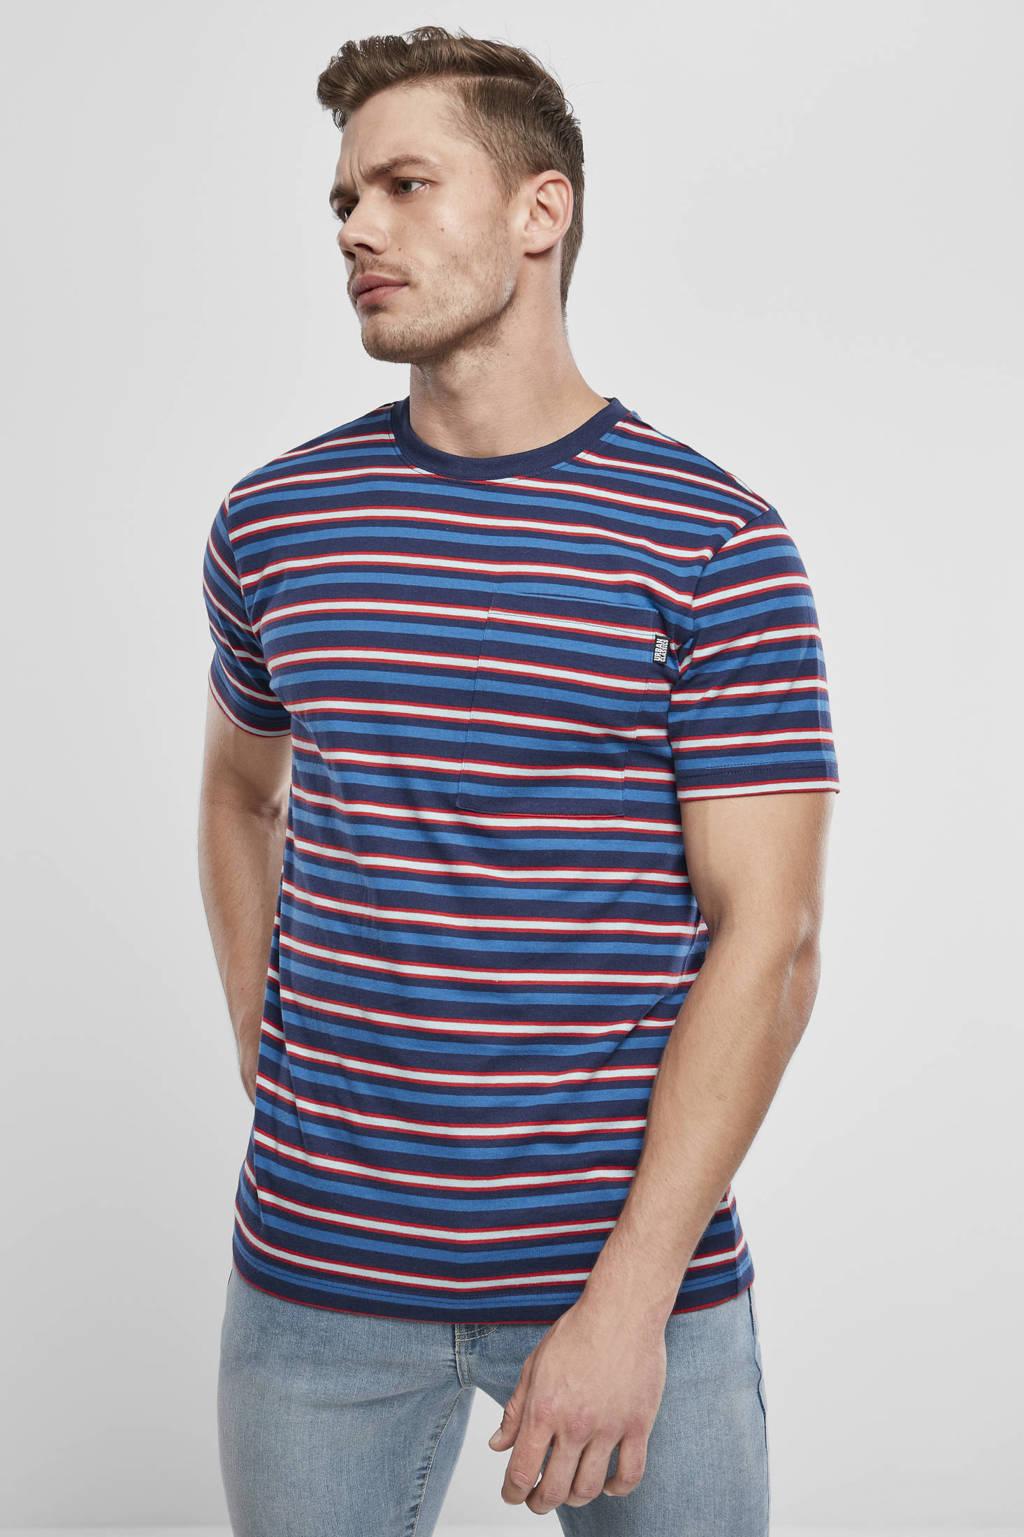 Urban Classics gestreept T-shirt donkerblauw/rood, Donkerblauw/rood